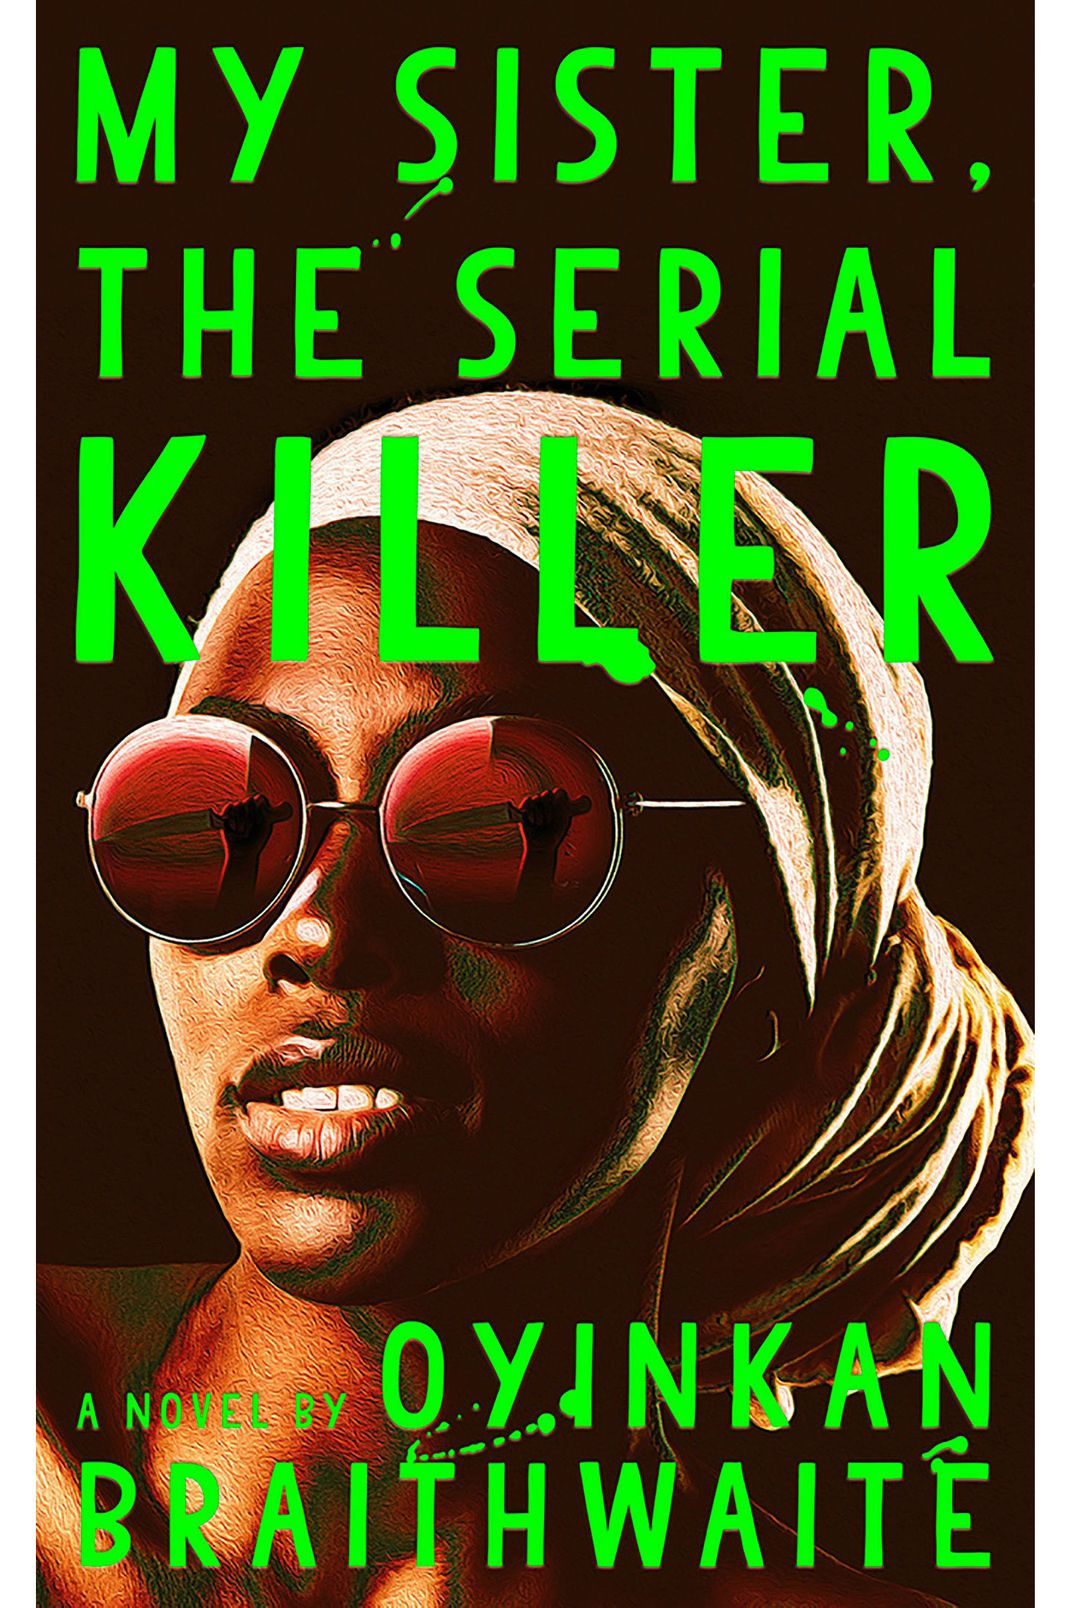 My Sister, the Serial Killer, by Oyinkan Braithwaite (Doubleday, November 20)